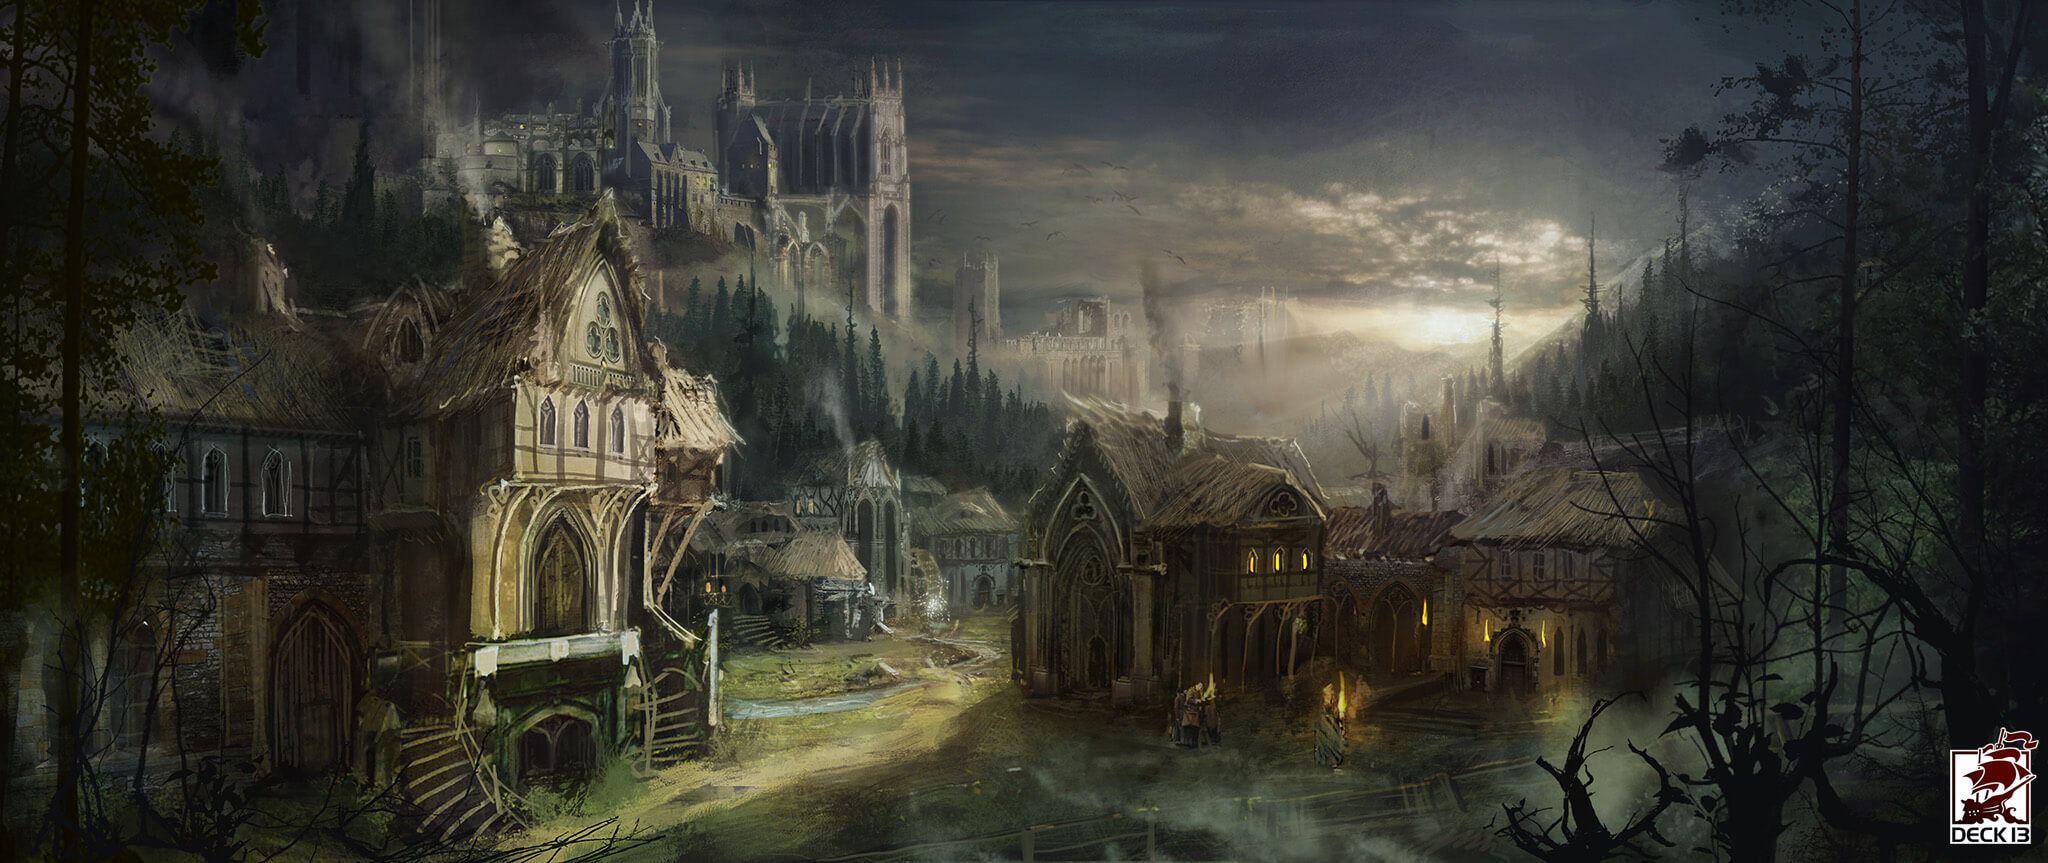 blood-knights-concept-art-felix-haas-darcliffe-enviro2